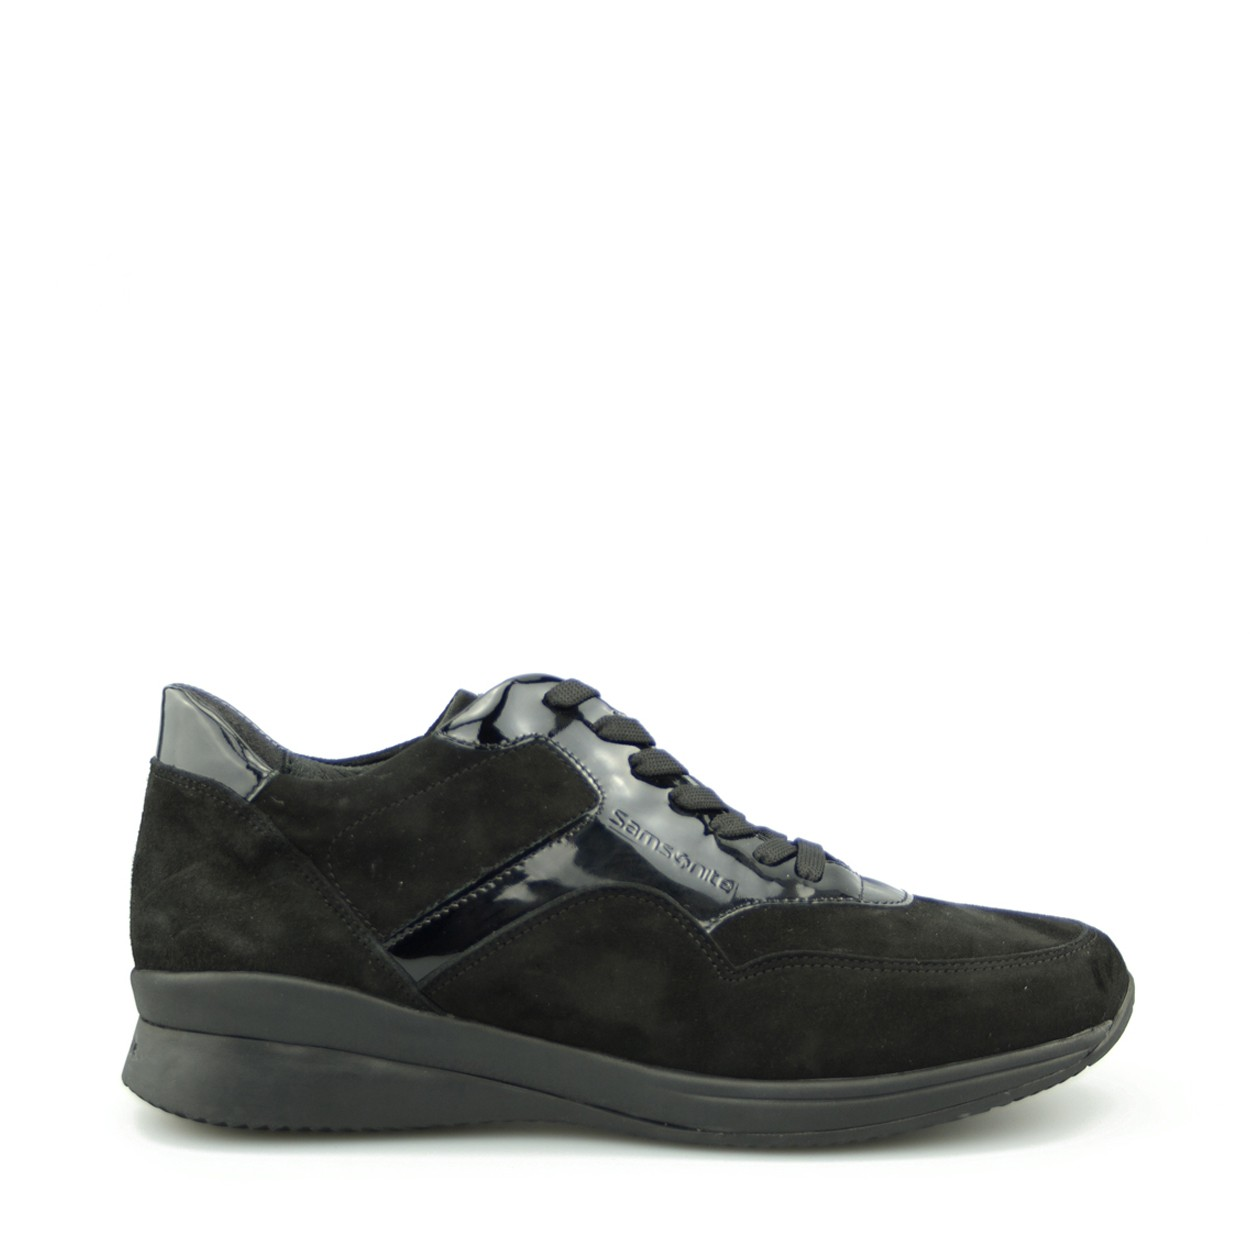 Samsonite Shoes Image